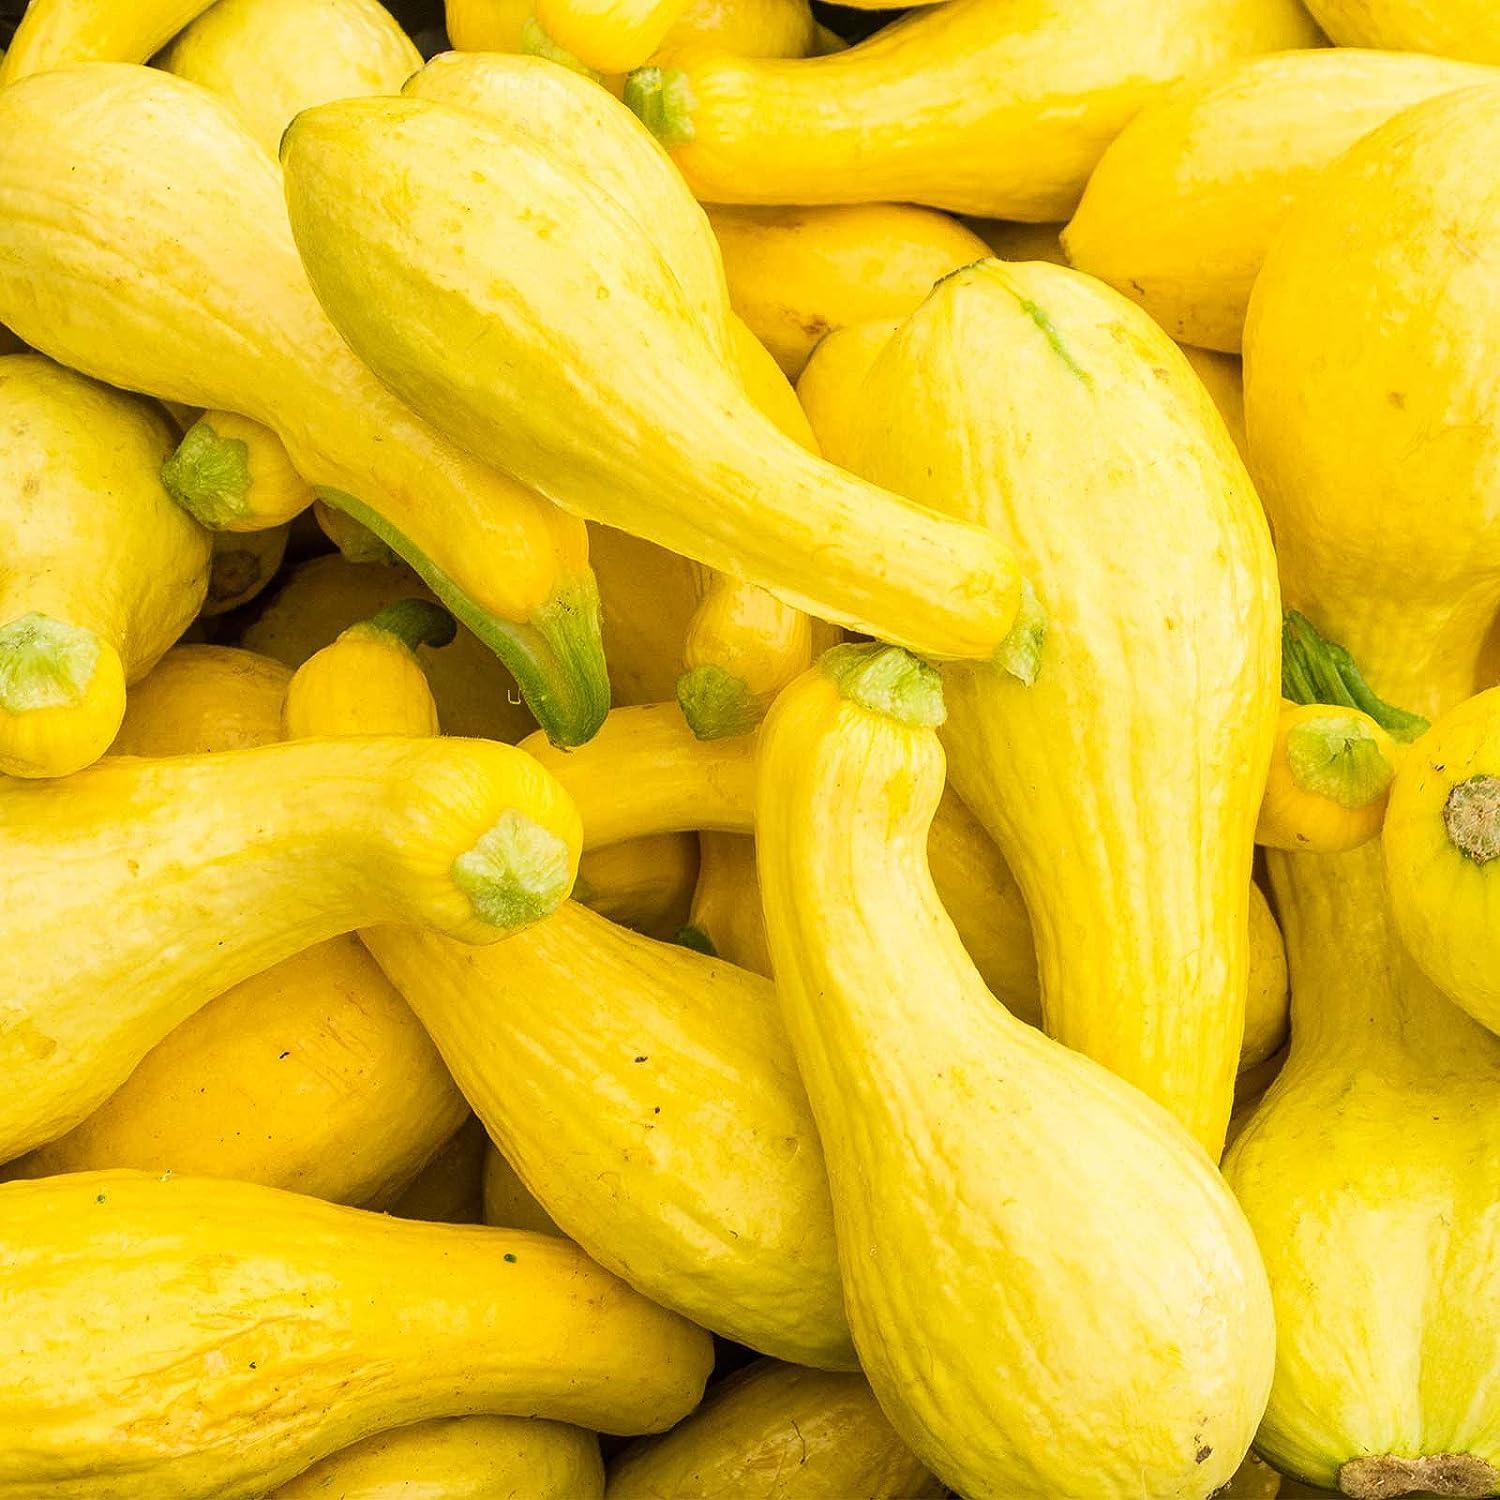 Crookneck Summer Squash Garden Seeds - 1 Lbs - Organic, Heirloom, Non-GMO - Vegetable Gardening Seed